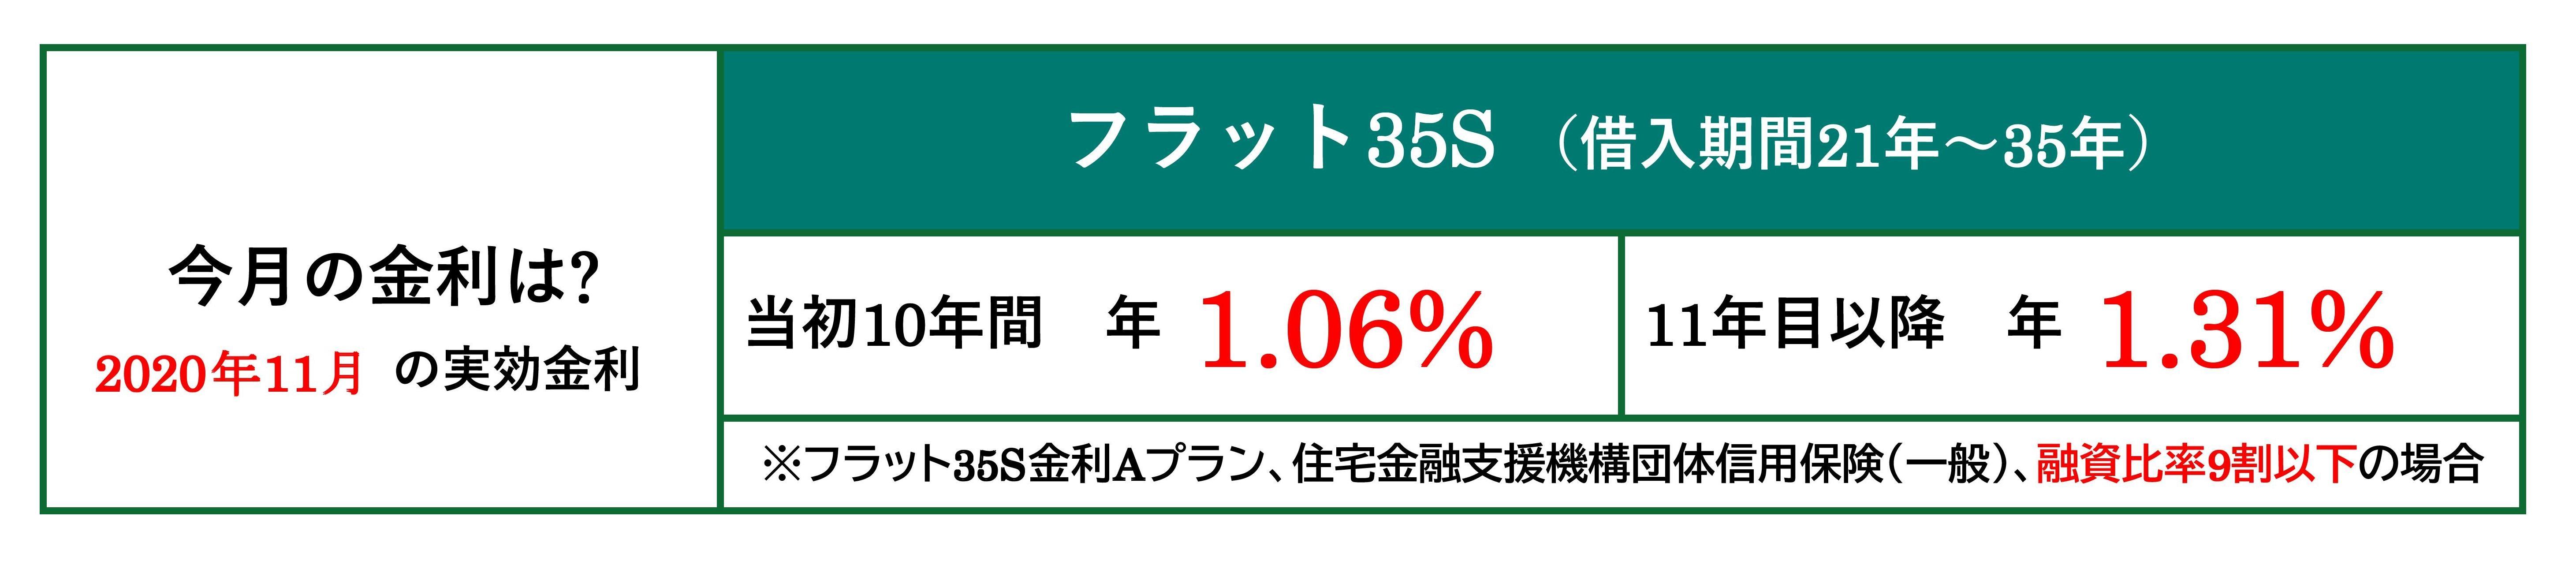 20201101kinri (1).jpg